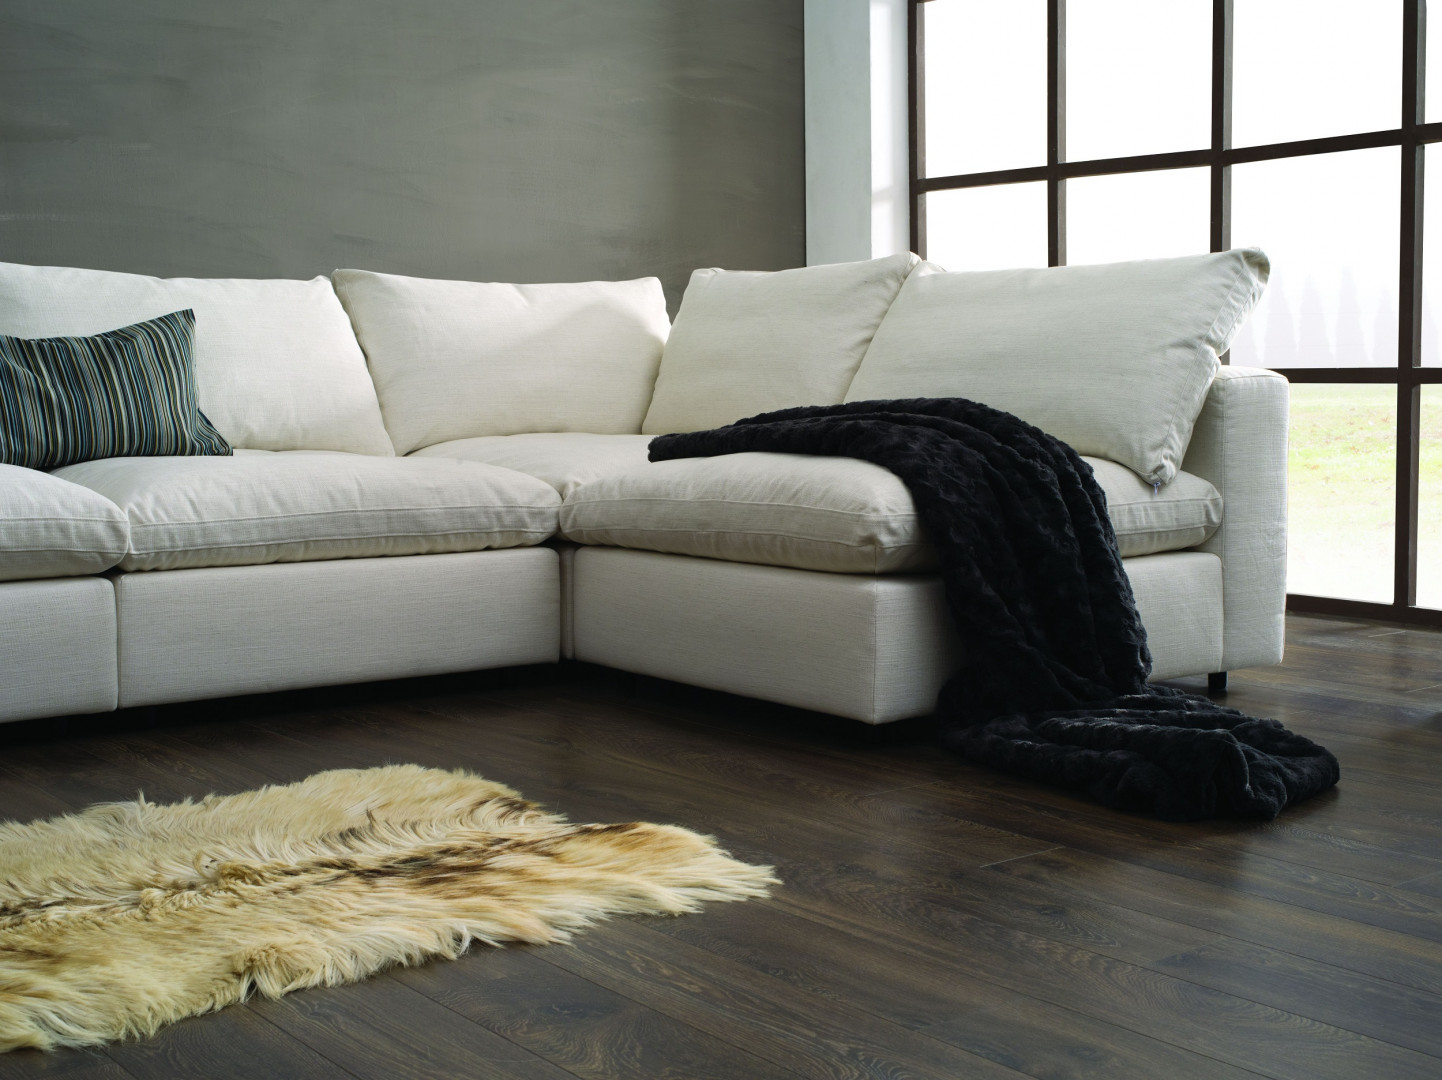 Sofa Lazy. Fot. Nordic Line